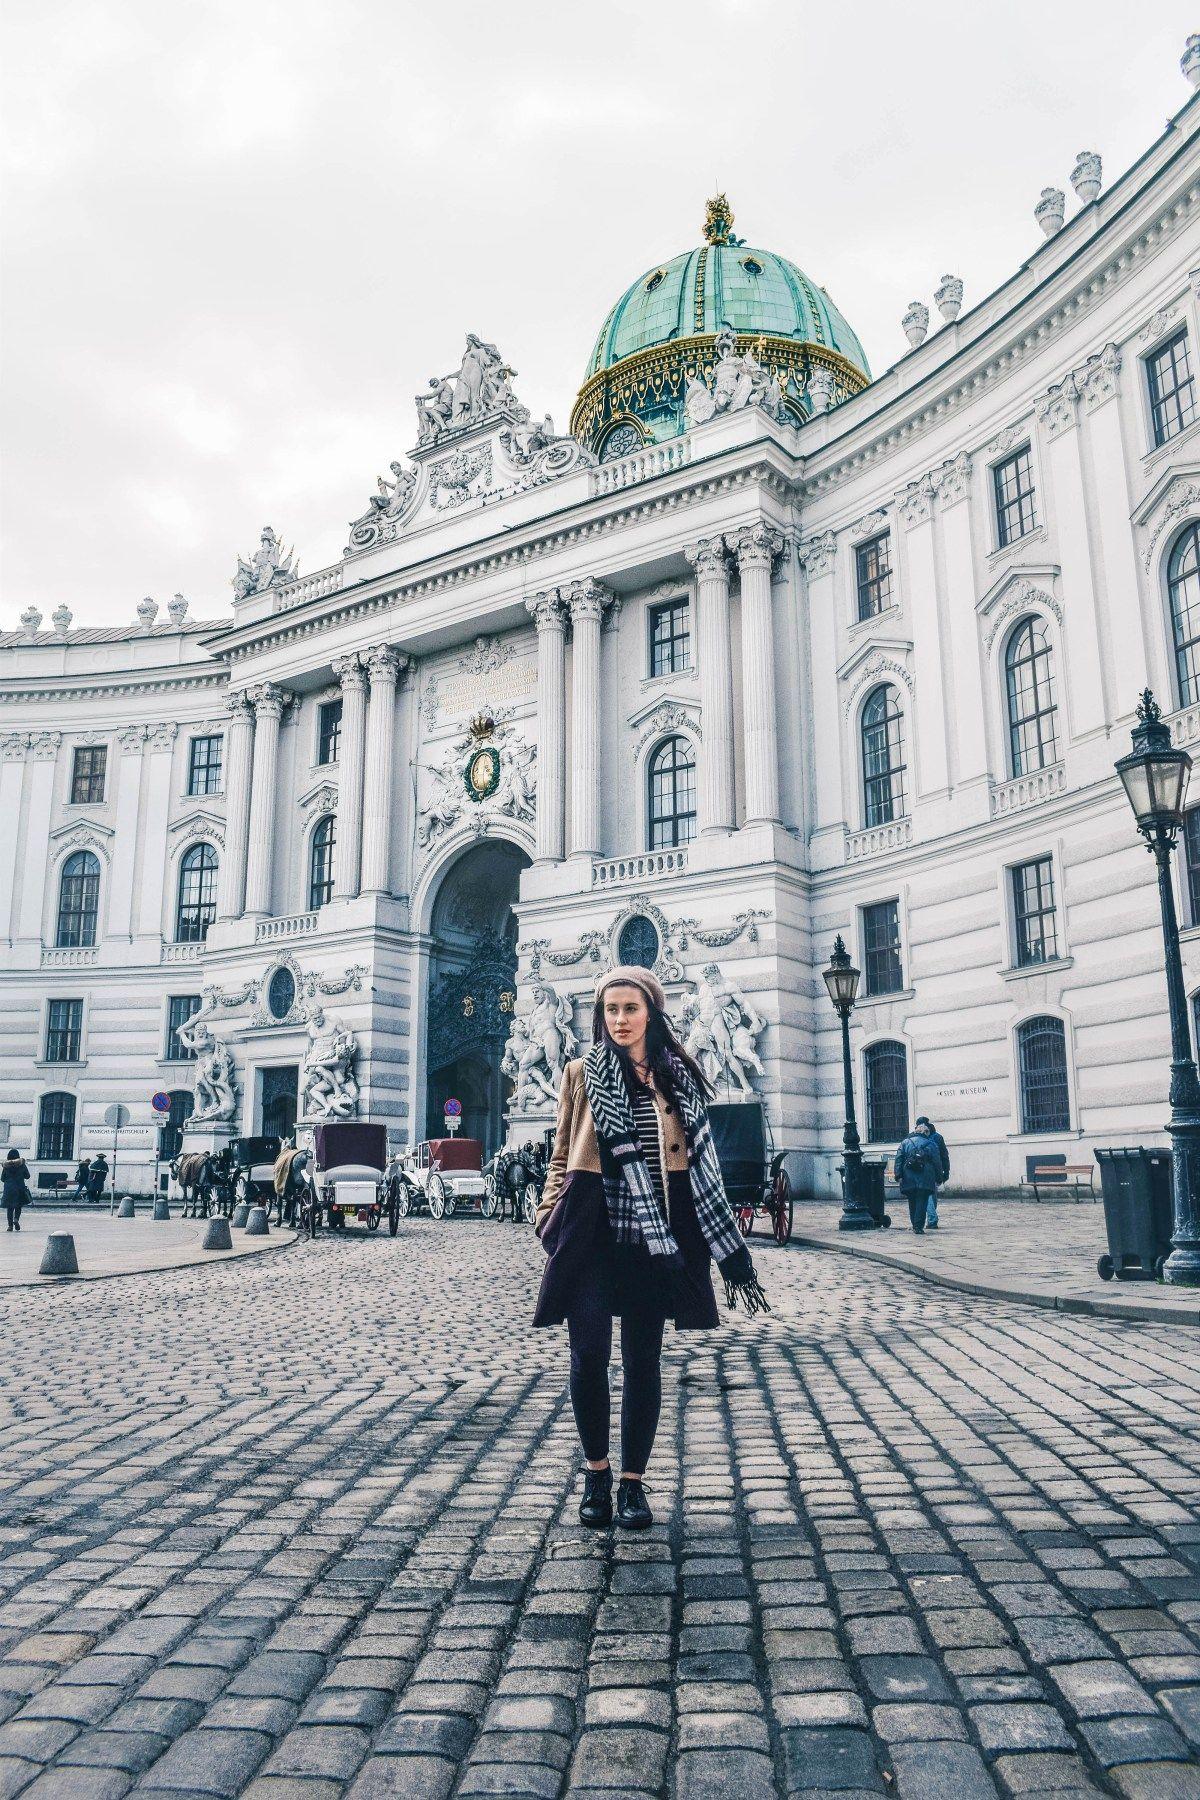 Best Things To Do In Vienna Austria A First Timer S Guide The Travel Leaf Vienna Travel Vienna Austria Travel